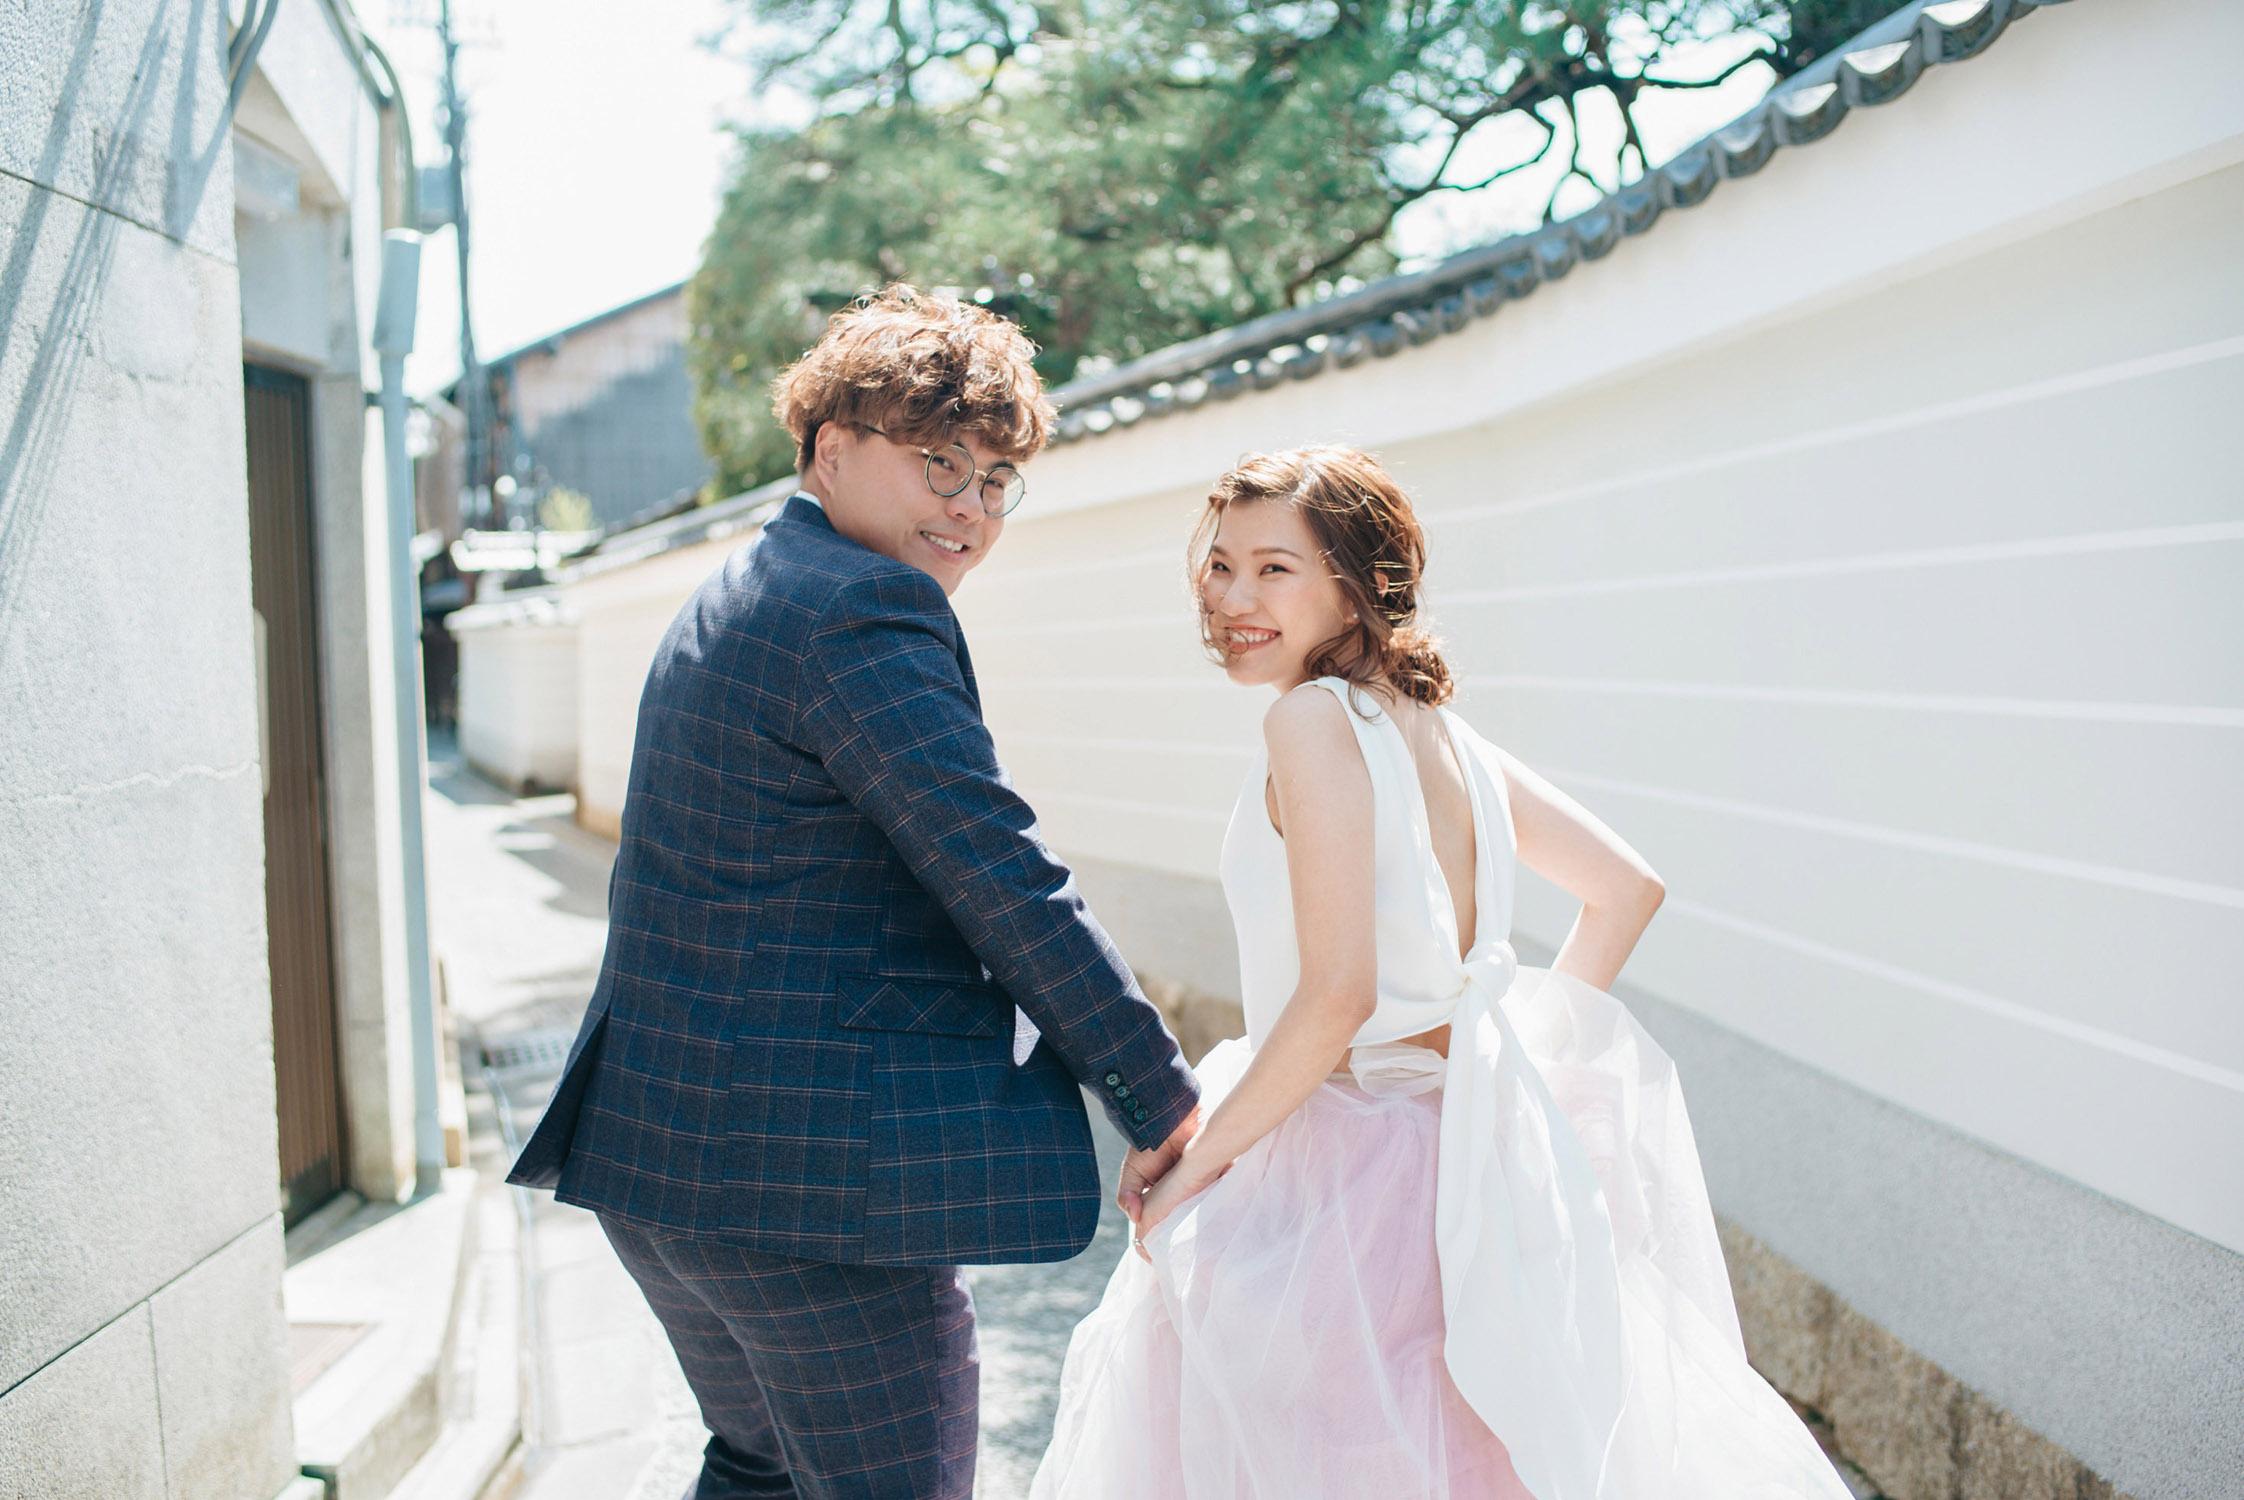 sweet-asian-wedding-couple-holding-hands